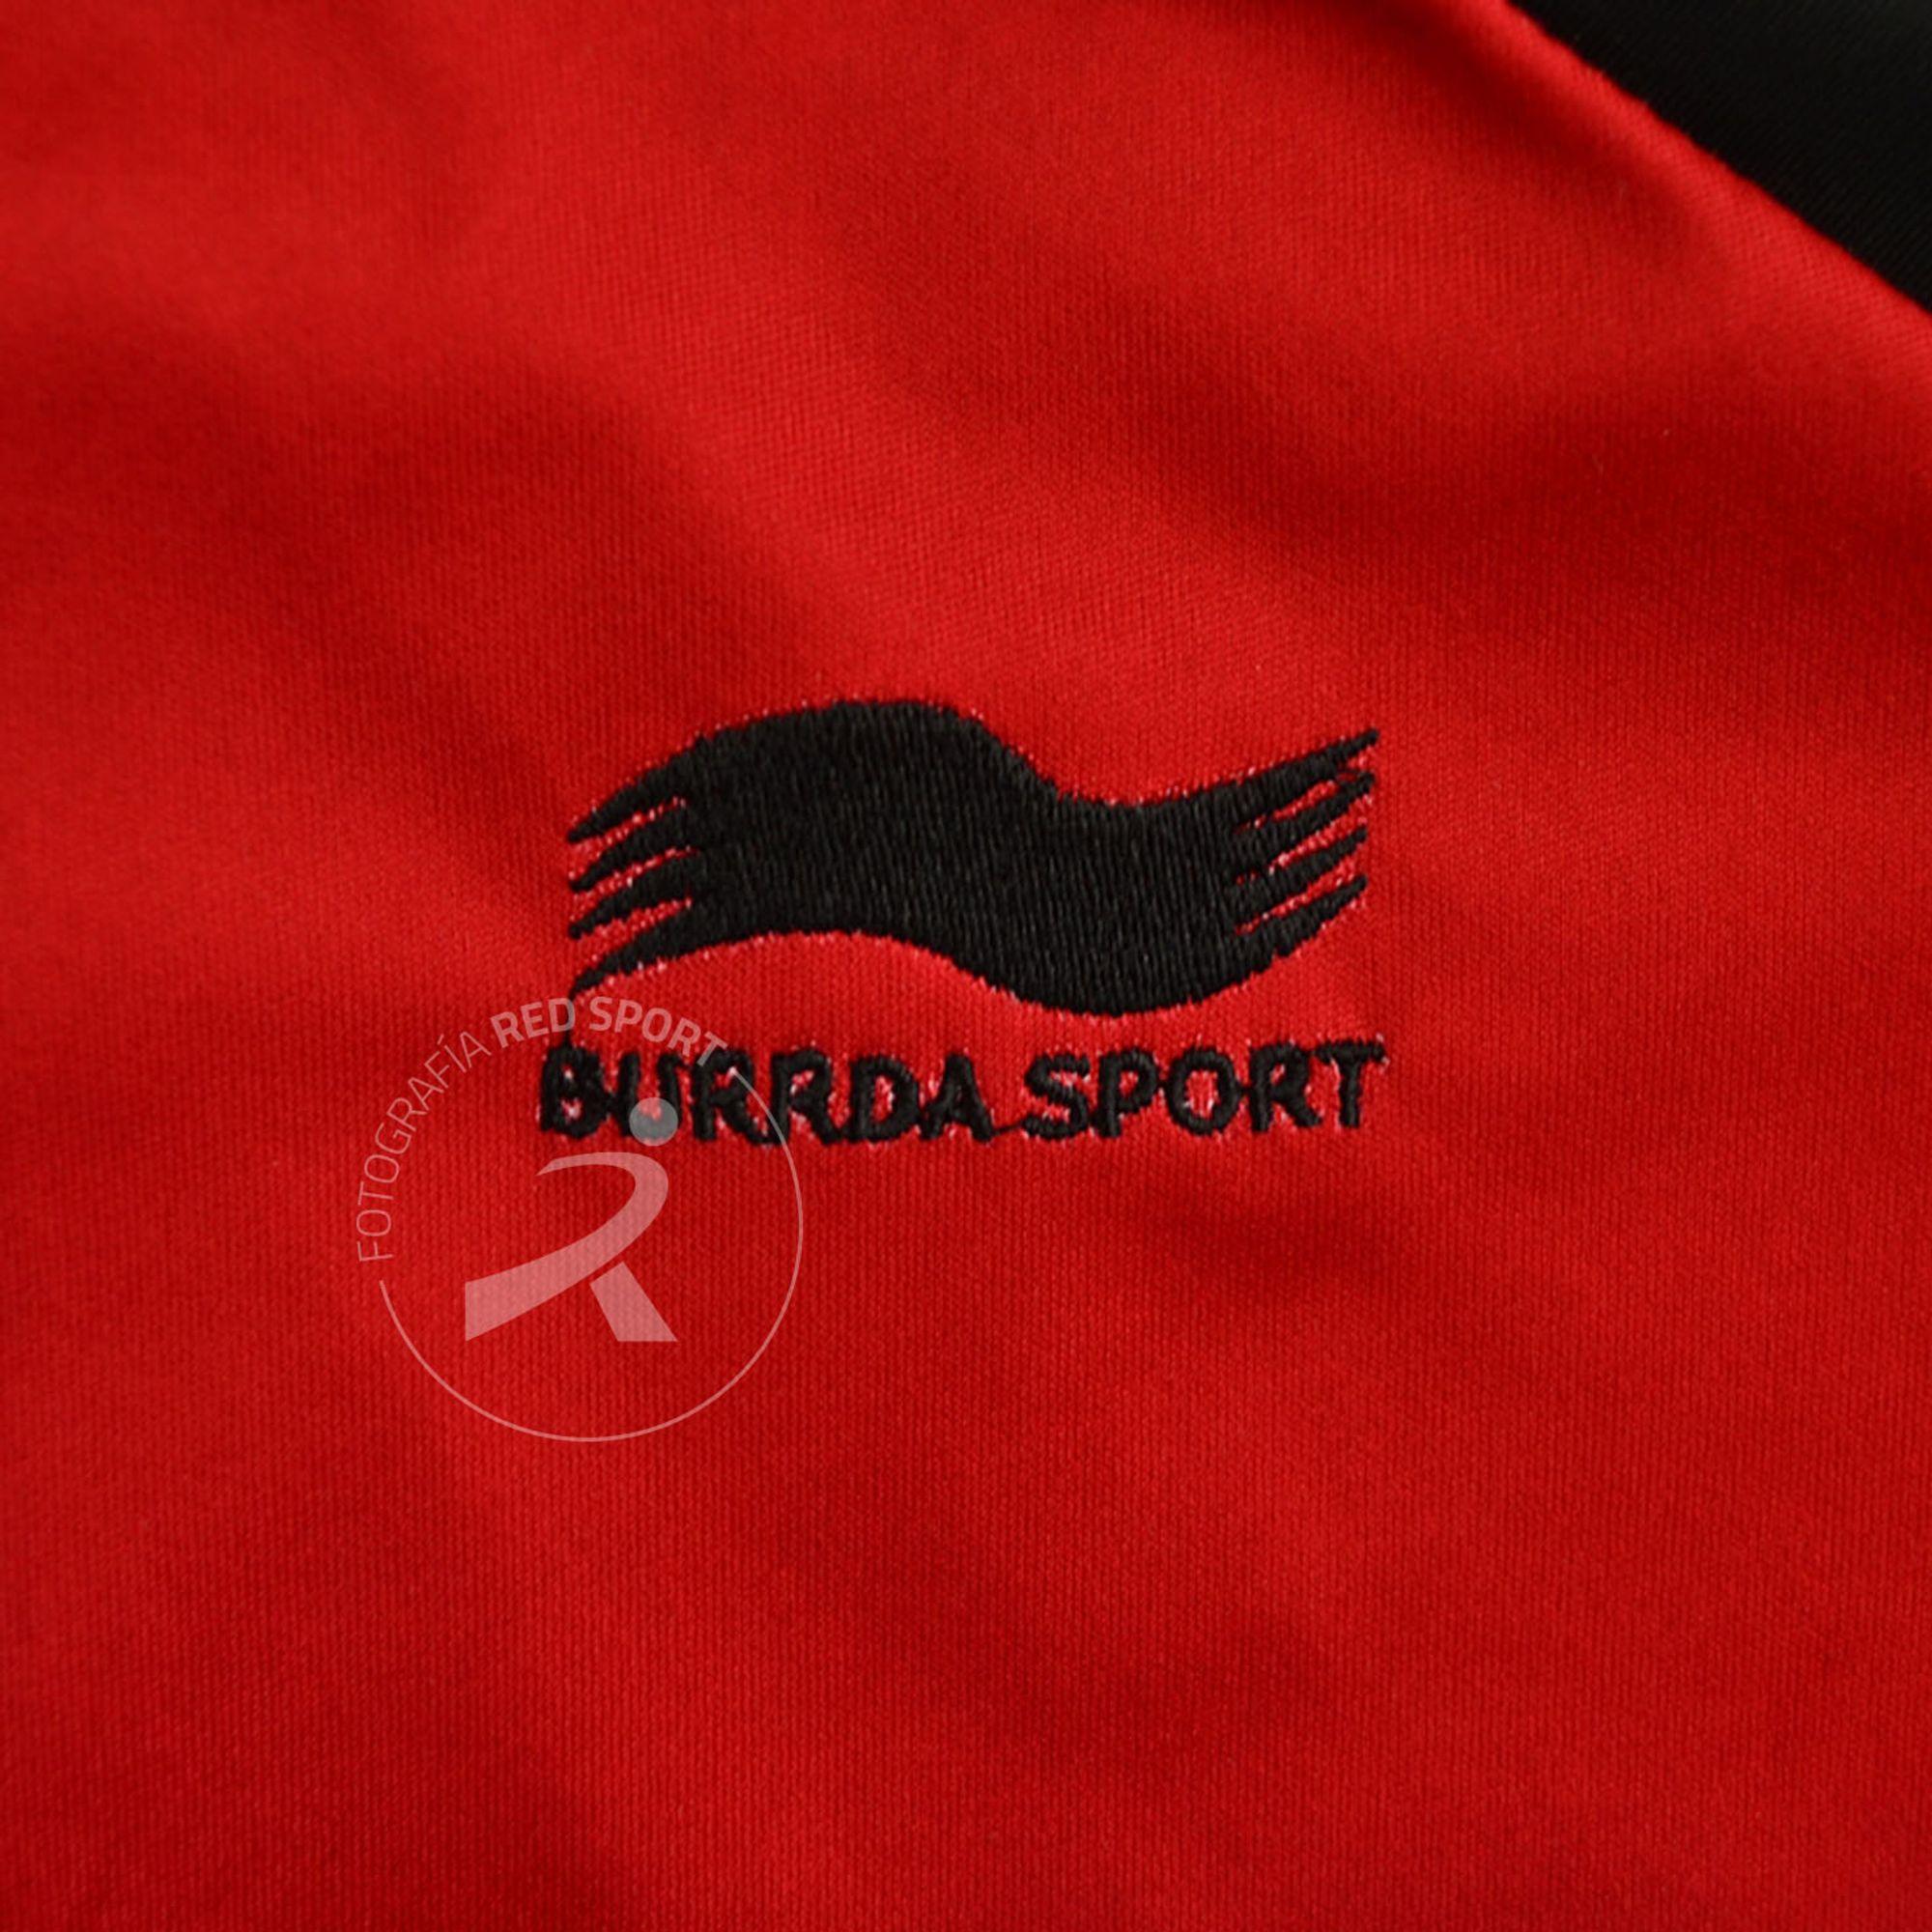 abb5a4cb3 CAMISETA BURRDA CLUB ATLÉTICO COLÓN OFICIAL 2018 NIÑO - redsport